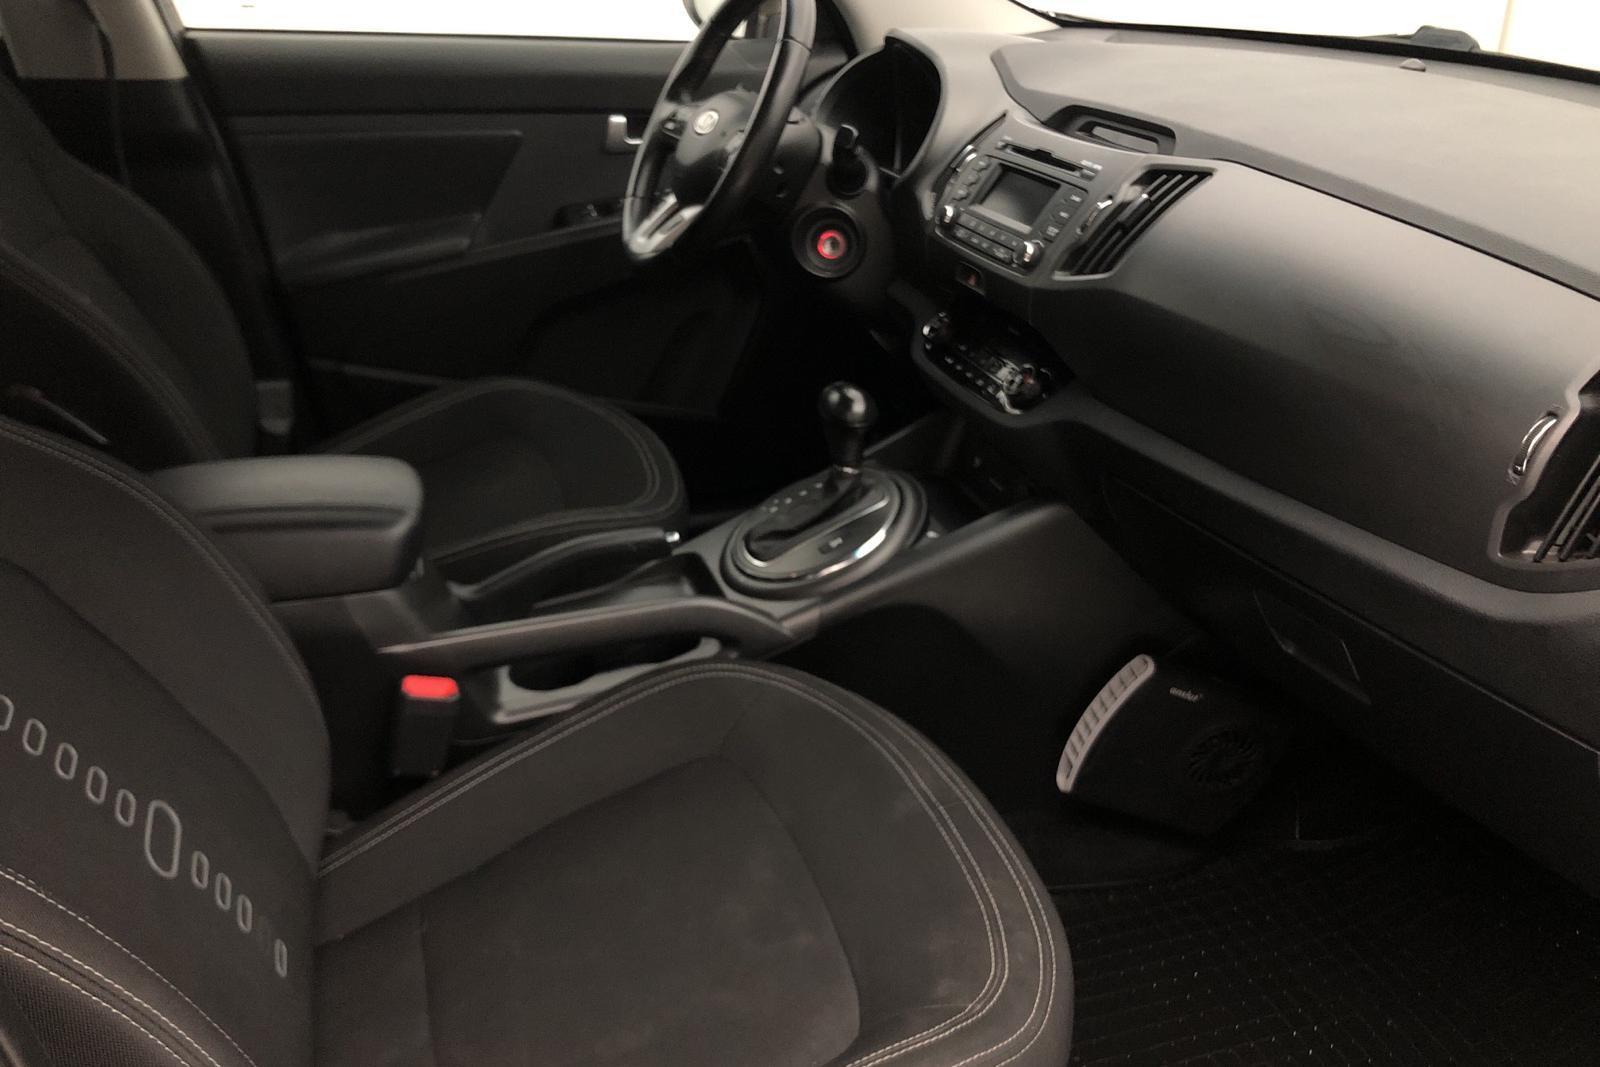 KIA Sportage 2.0 CRDi AWD (136hk) - 19 300 mil - Automat - Light Brown - 2012